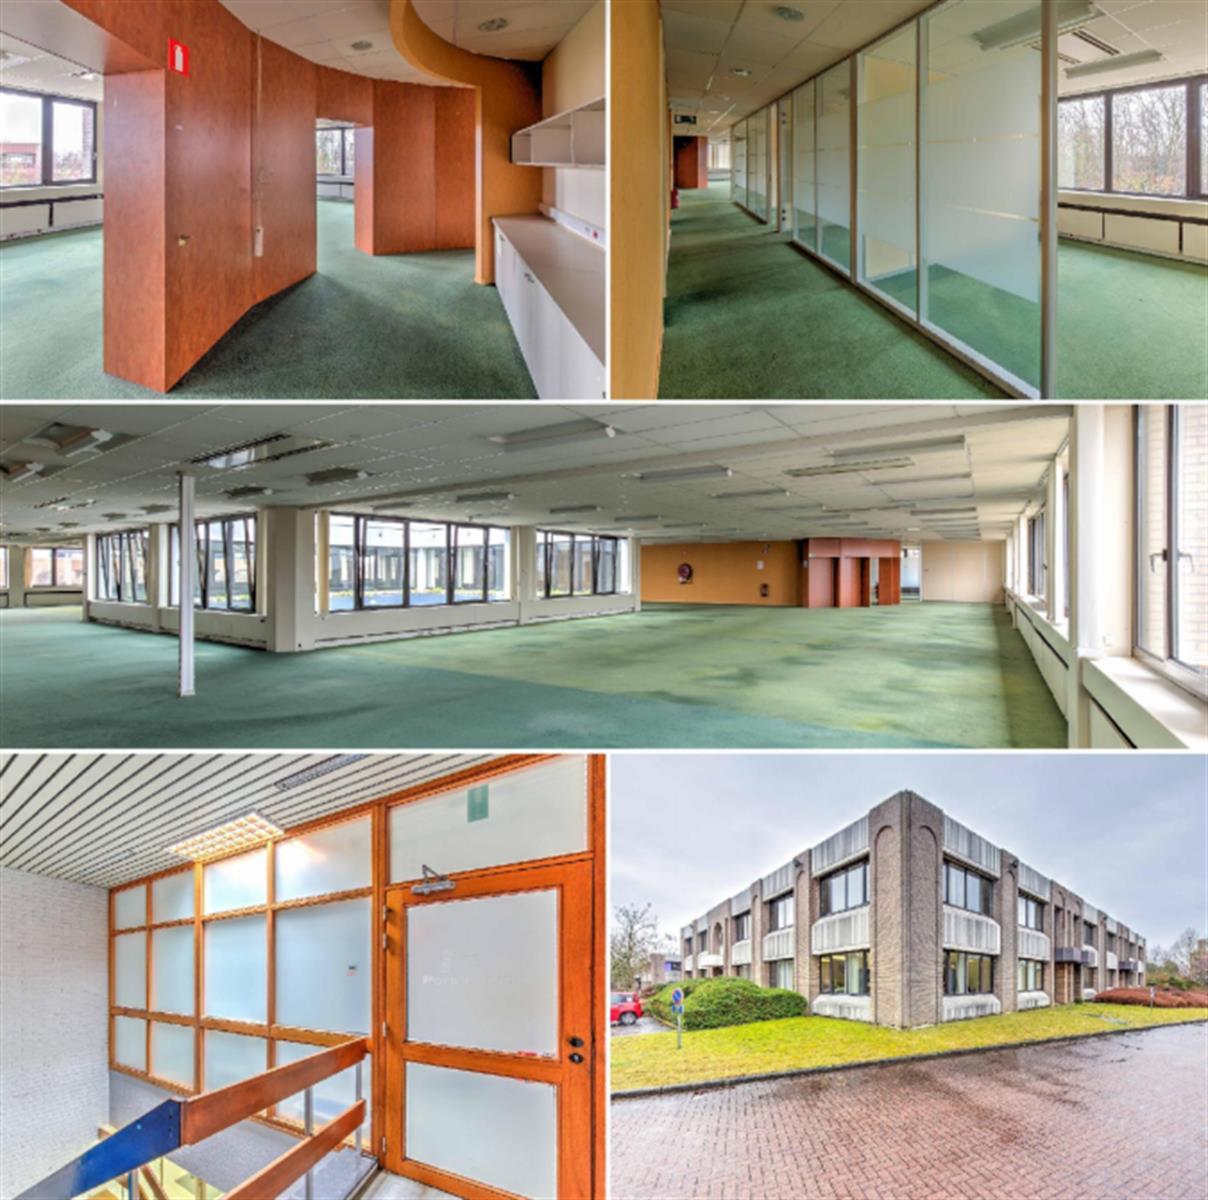 kantoor te huur VV2006 - Kantoorgebouw - Imperiastraat 8, 1930 Zaventem, België 3